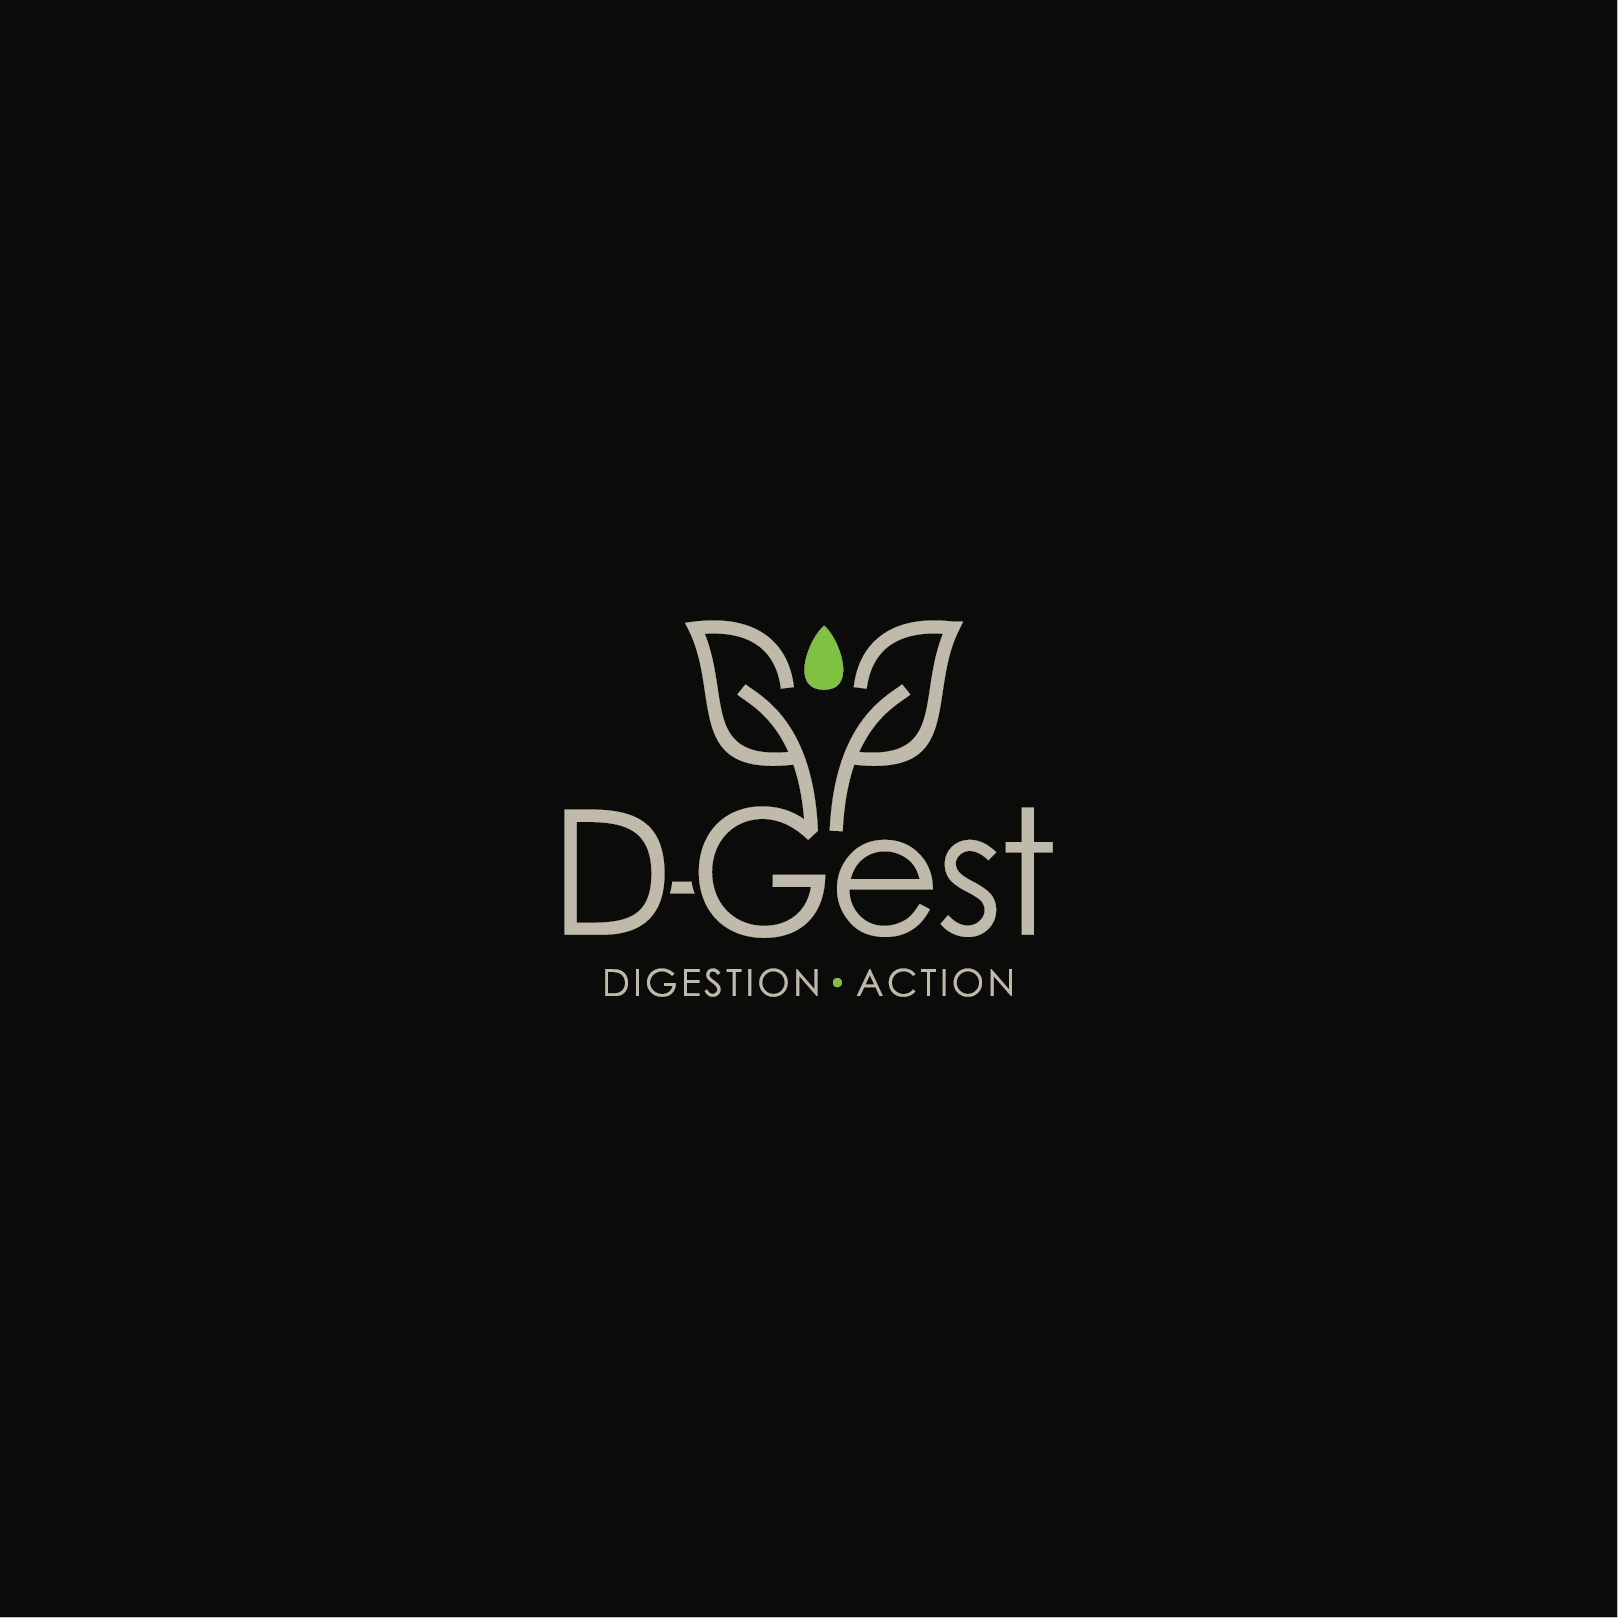 Create an elegant logo for a vegan, organic, herbal supplement line for Digestive Health